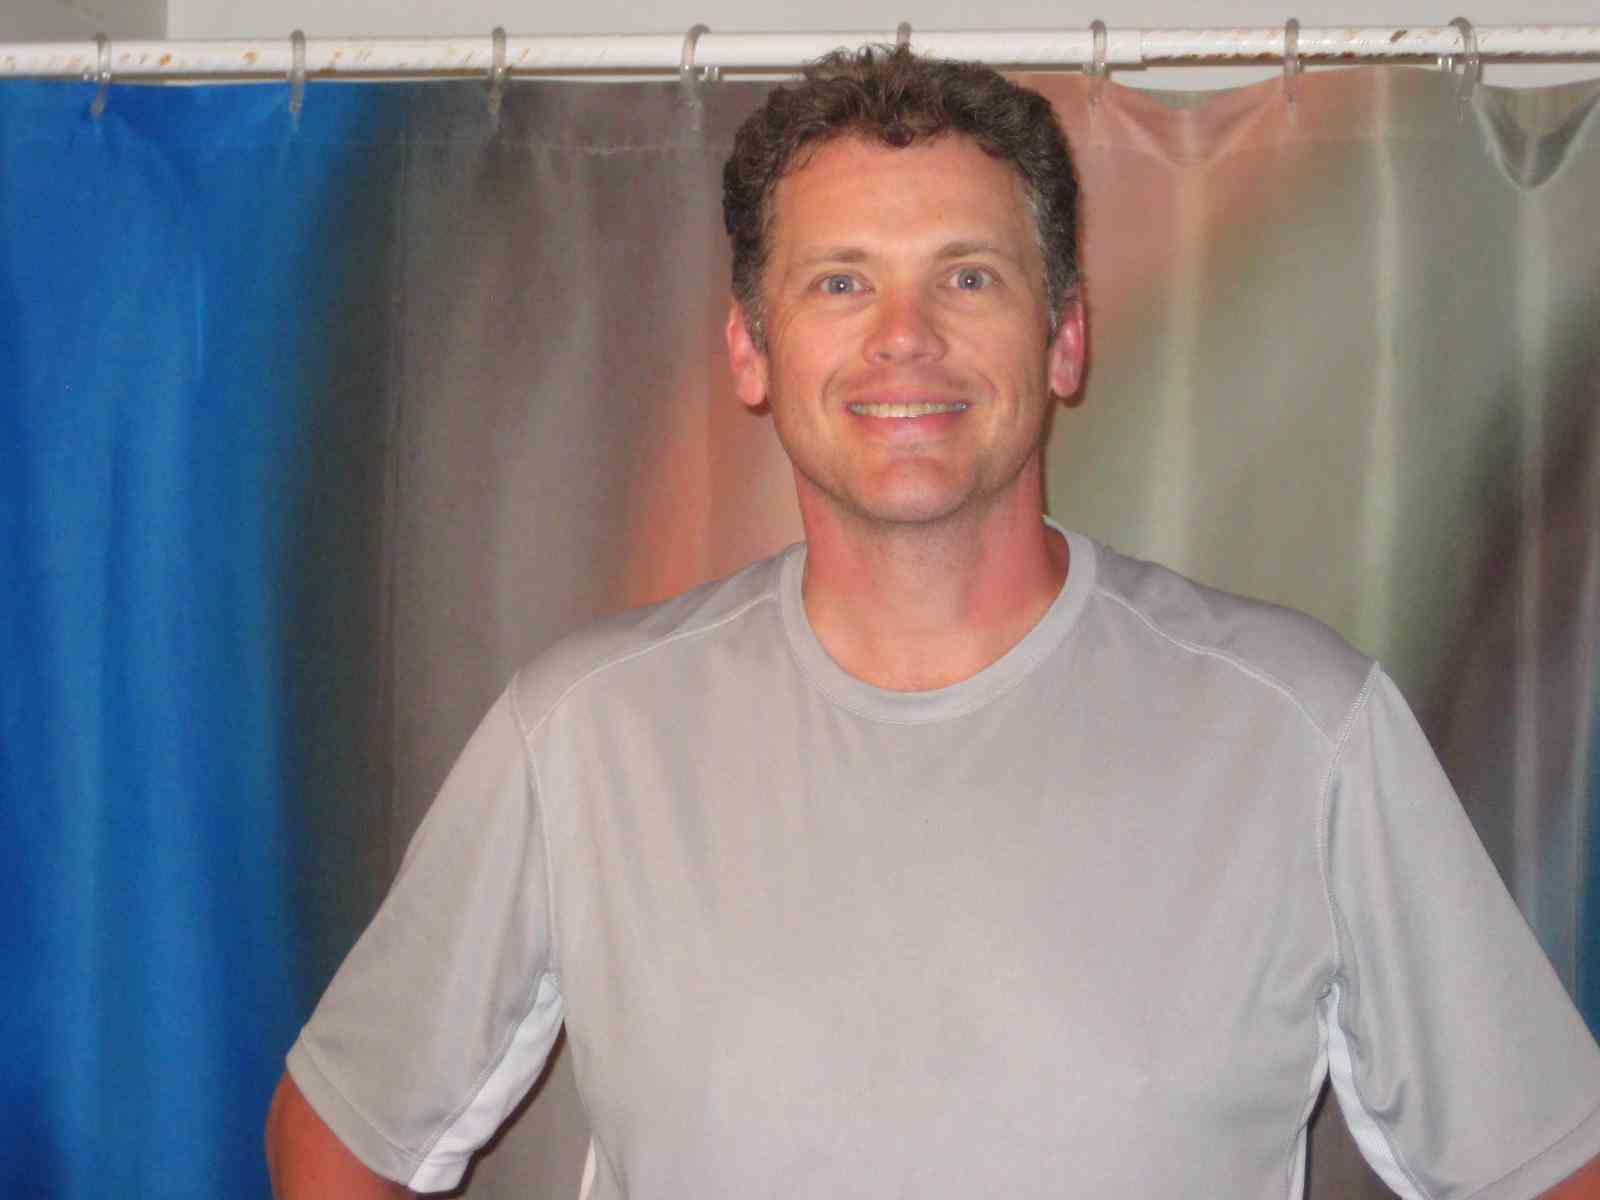 Joe Hilyar